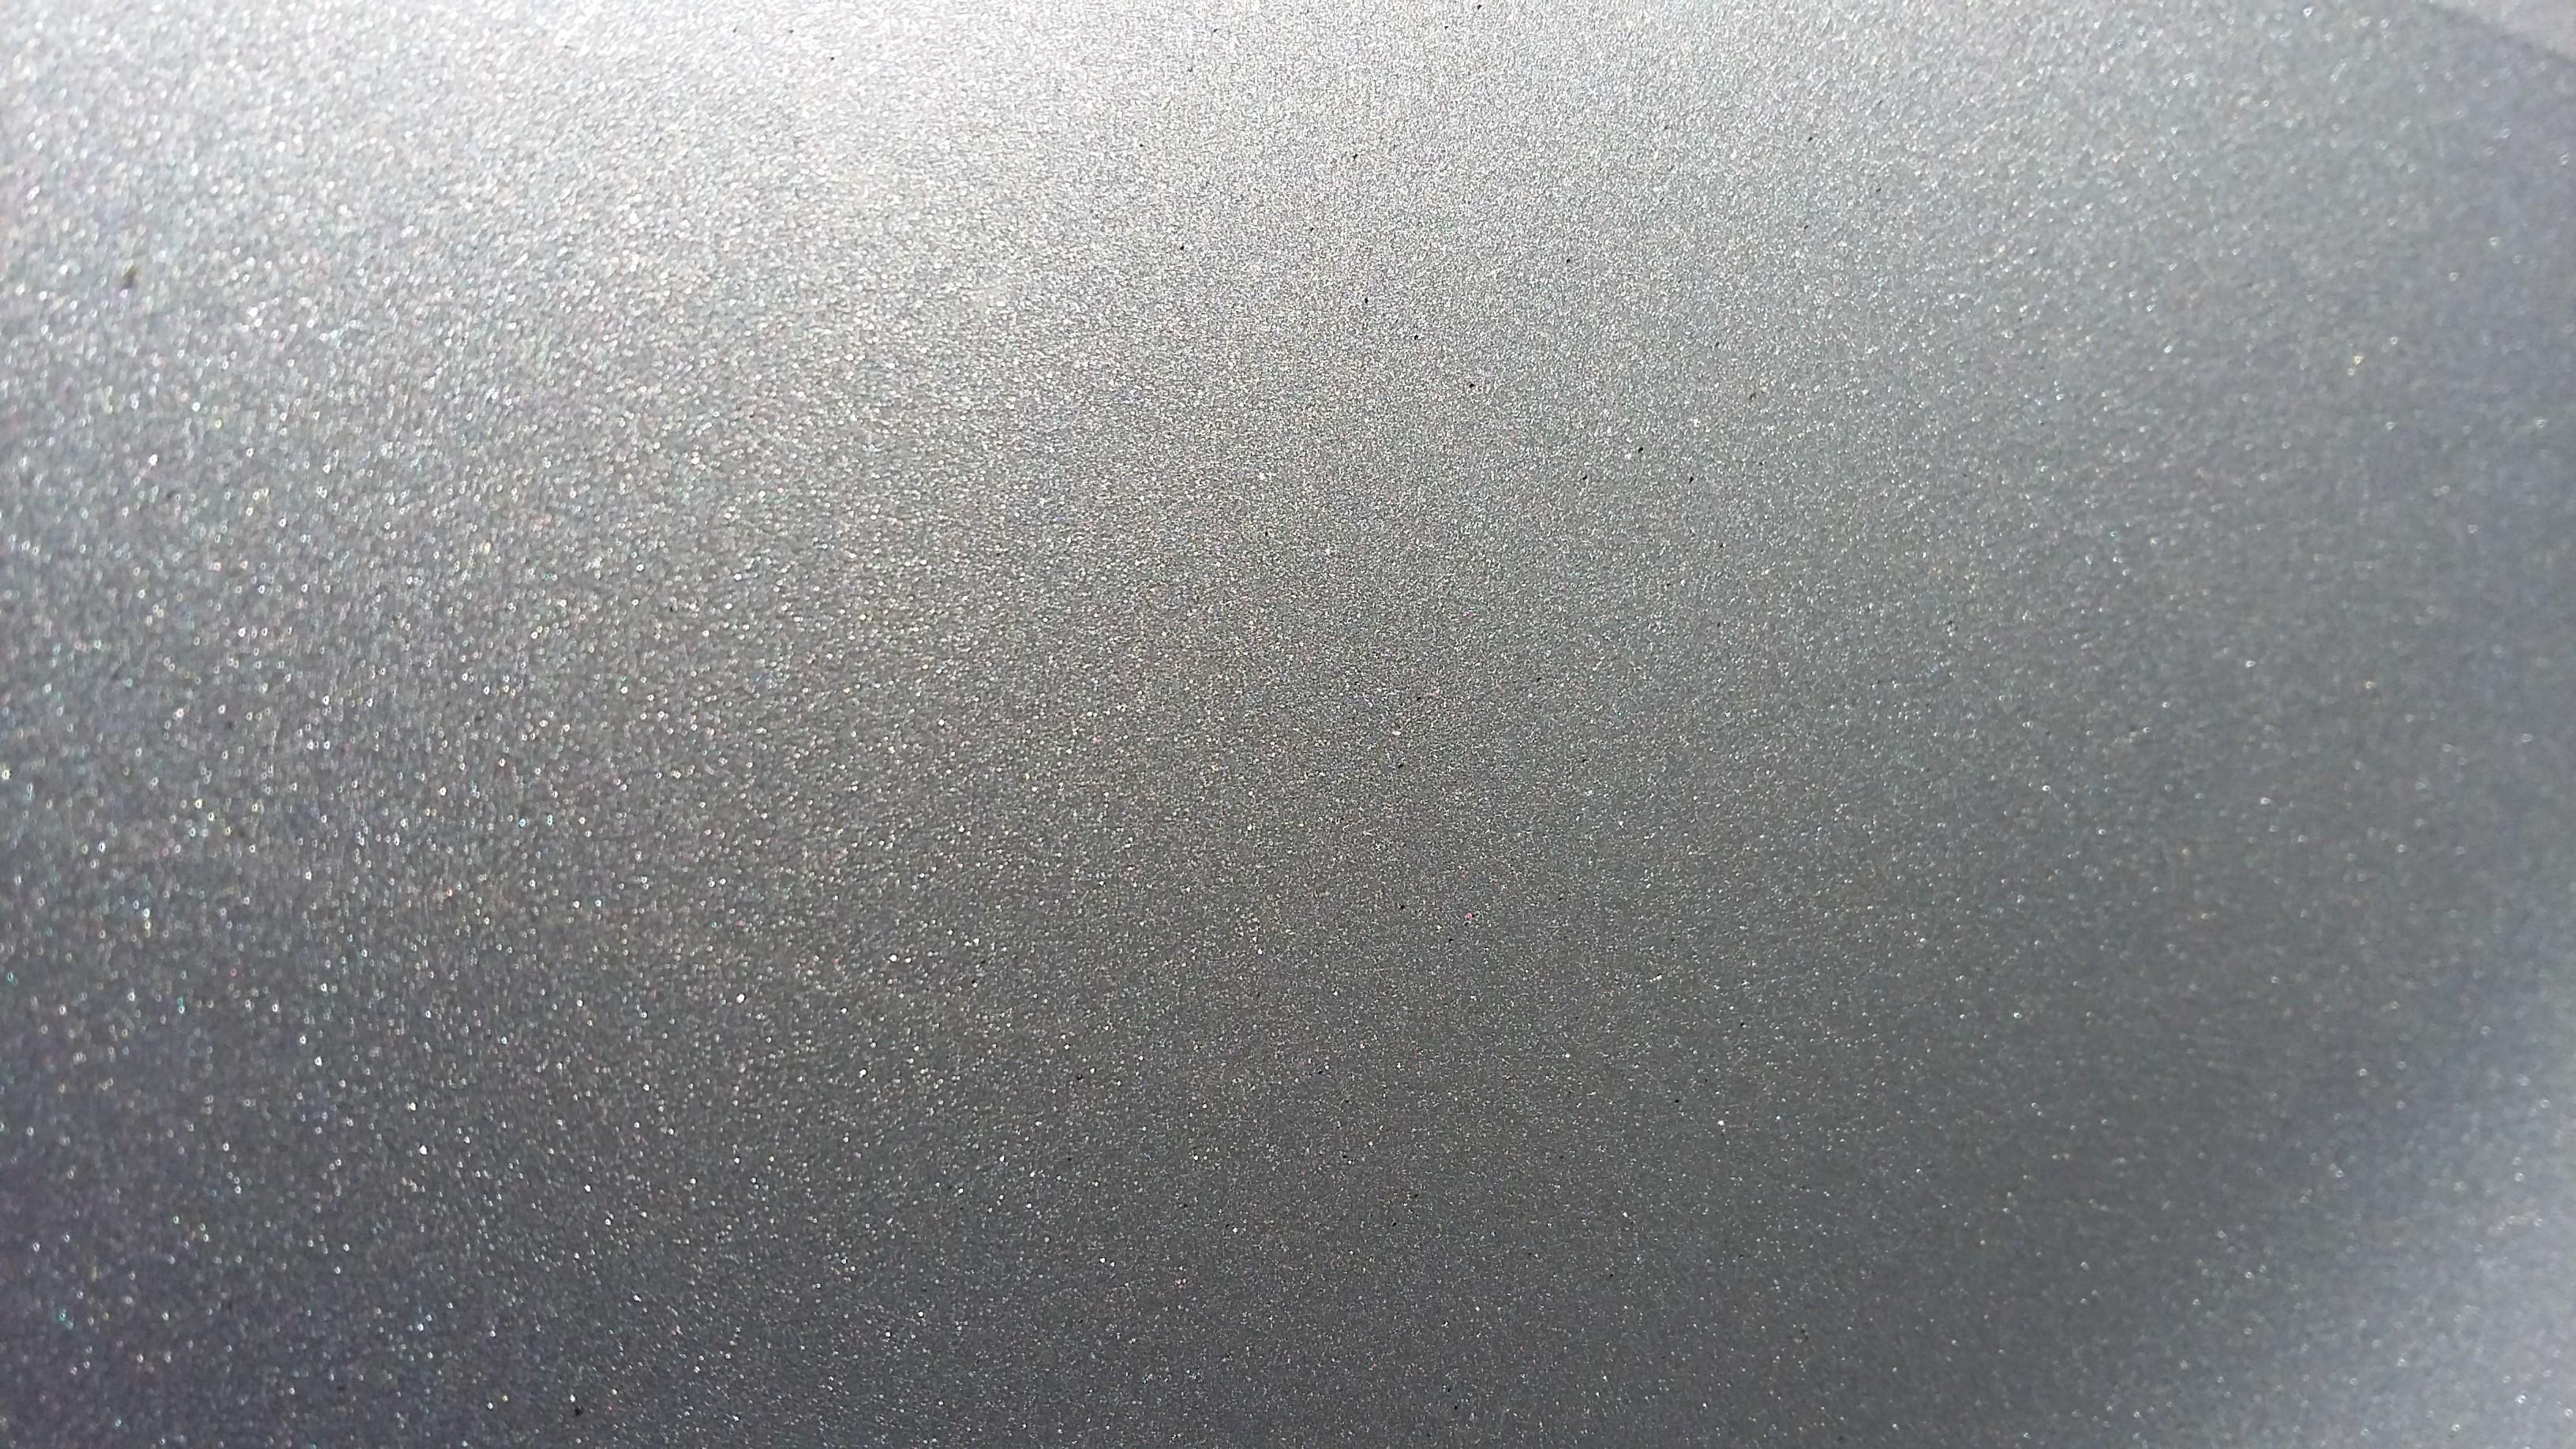 FCC26F03-03D5-4DA0-9B96-5D1E19CD6DD8.JPG